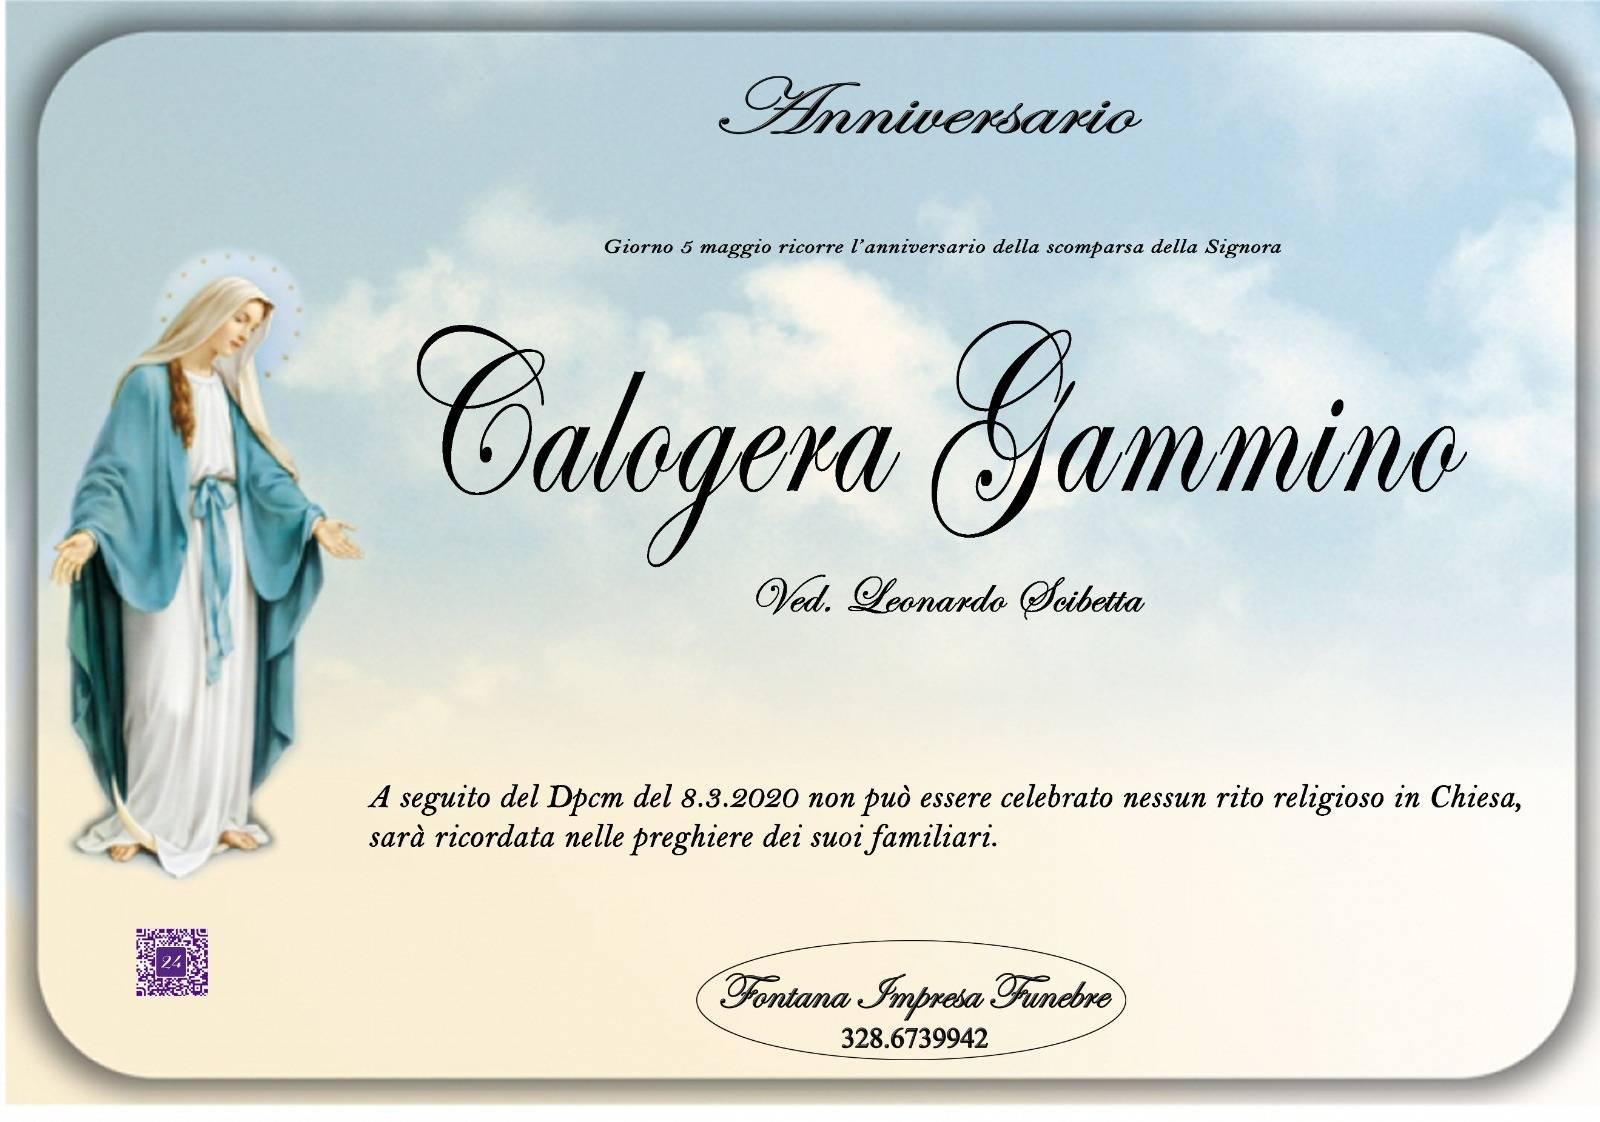 Calogera Gammino